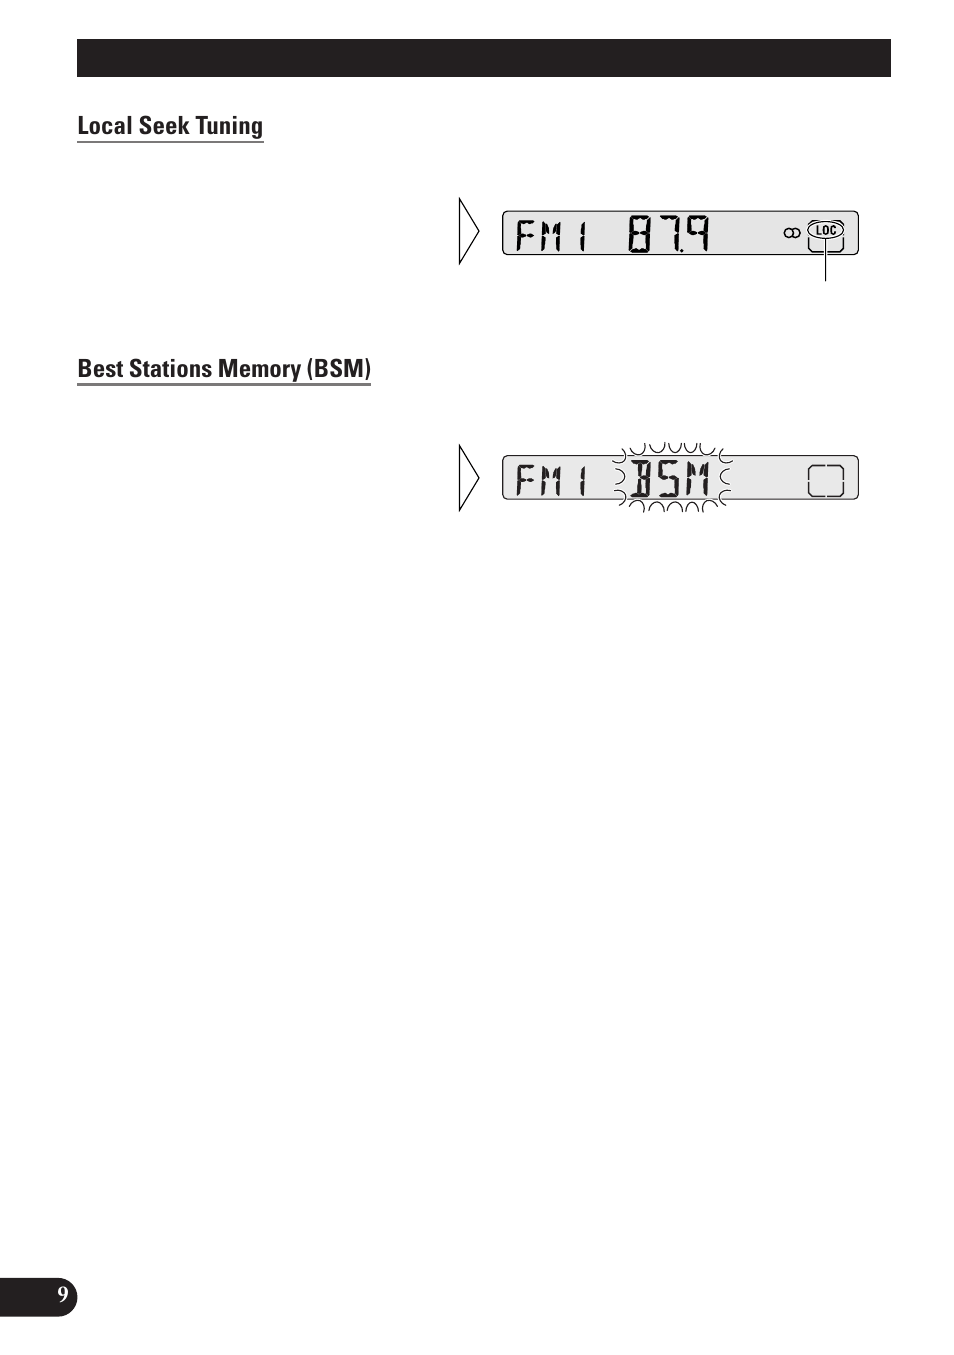 pioneer deh 2100 page10?resize\\\\\\\\\\\\\\\\\\\\\\\\\\\\\\\=665%2C945 pioneer deh 24ub wiring diagram pioneer wiring diagrams pioneer deh 24ub wiring diagram at alyssarenee.co